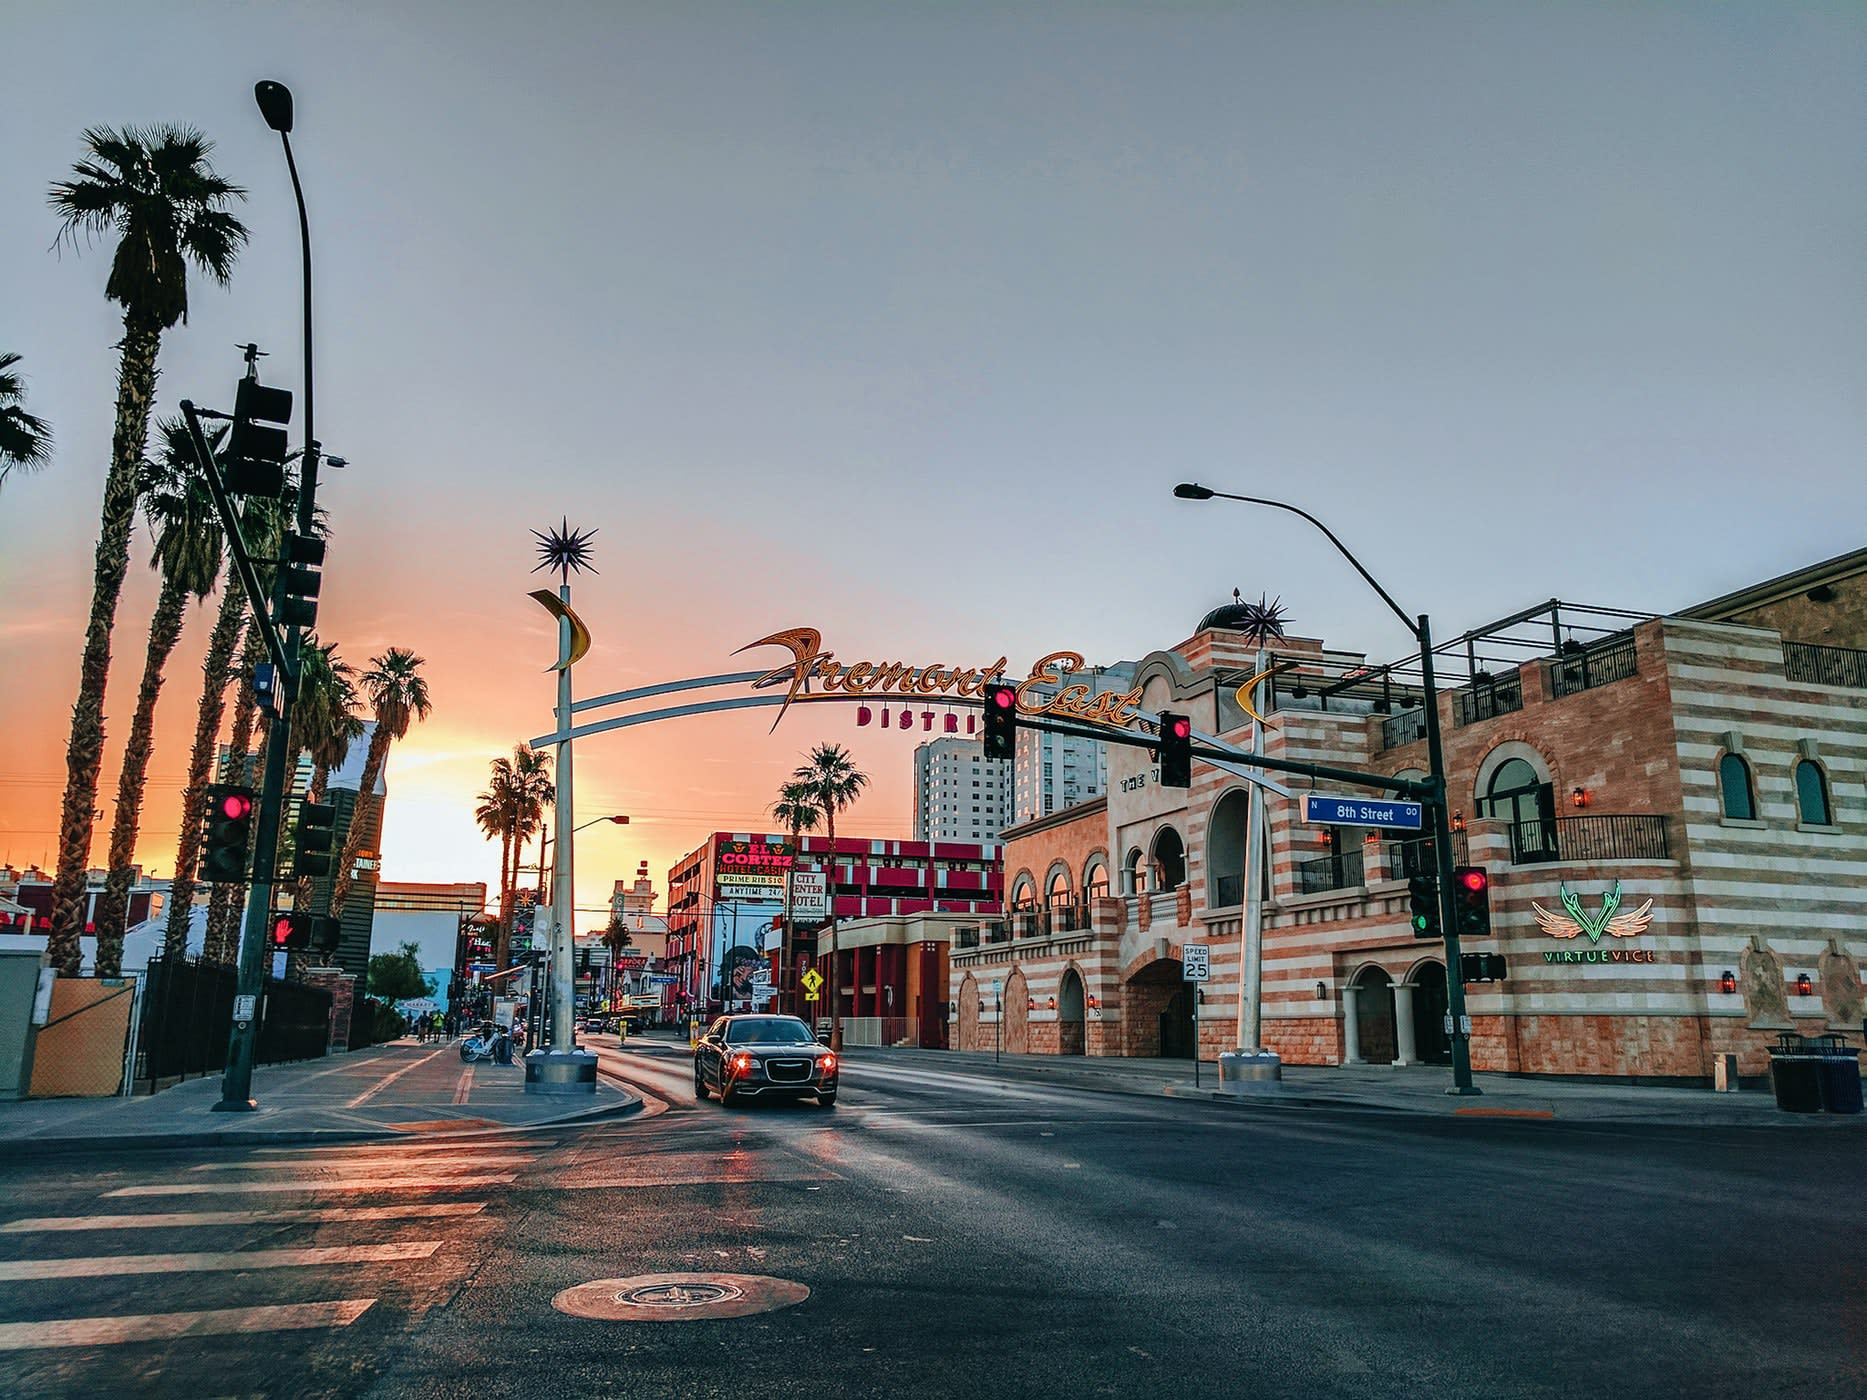 Greentube přidává Cops 'n' Robbers Vegas Nights ke svému vkusu v Las Vegas